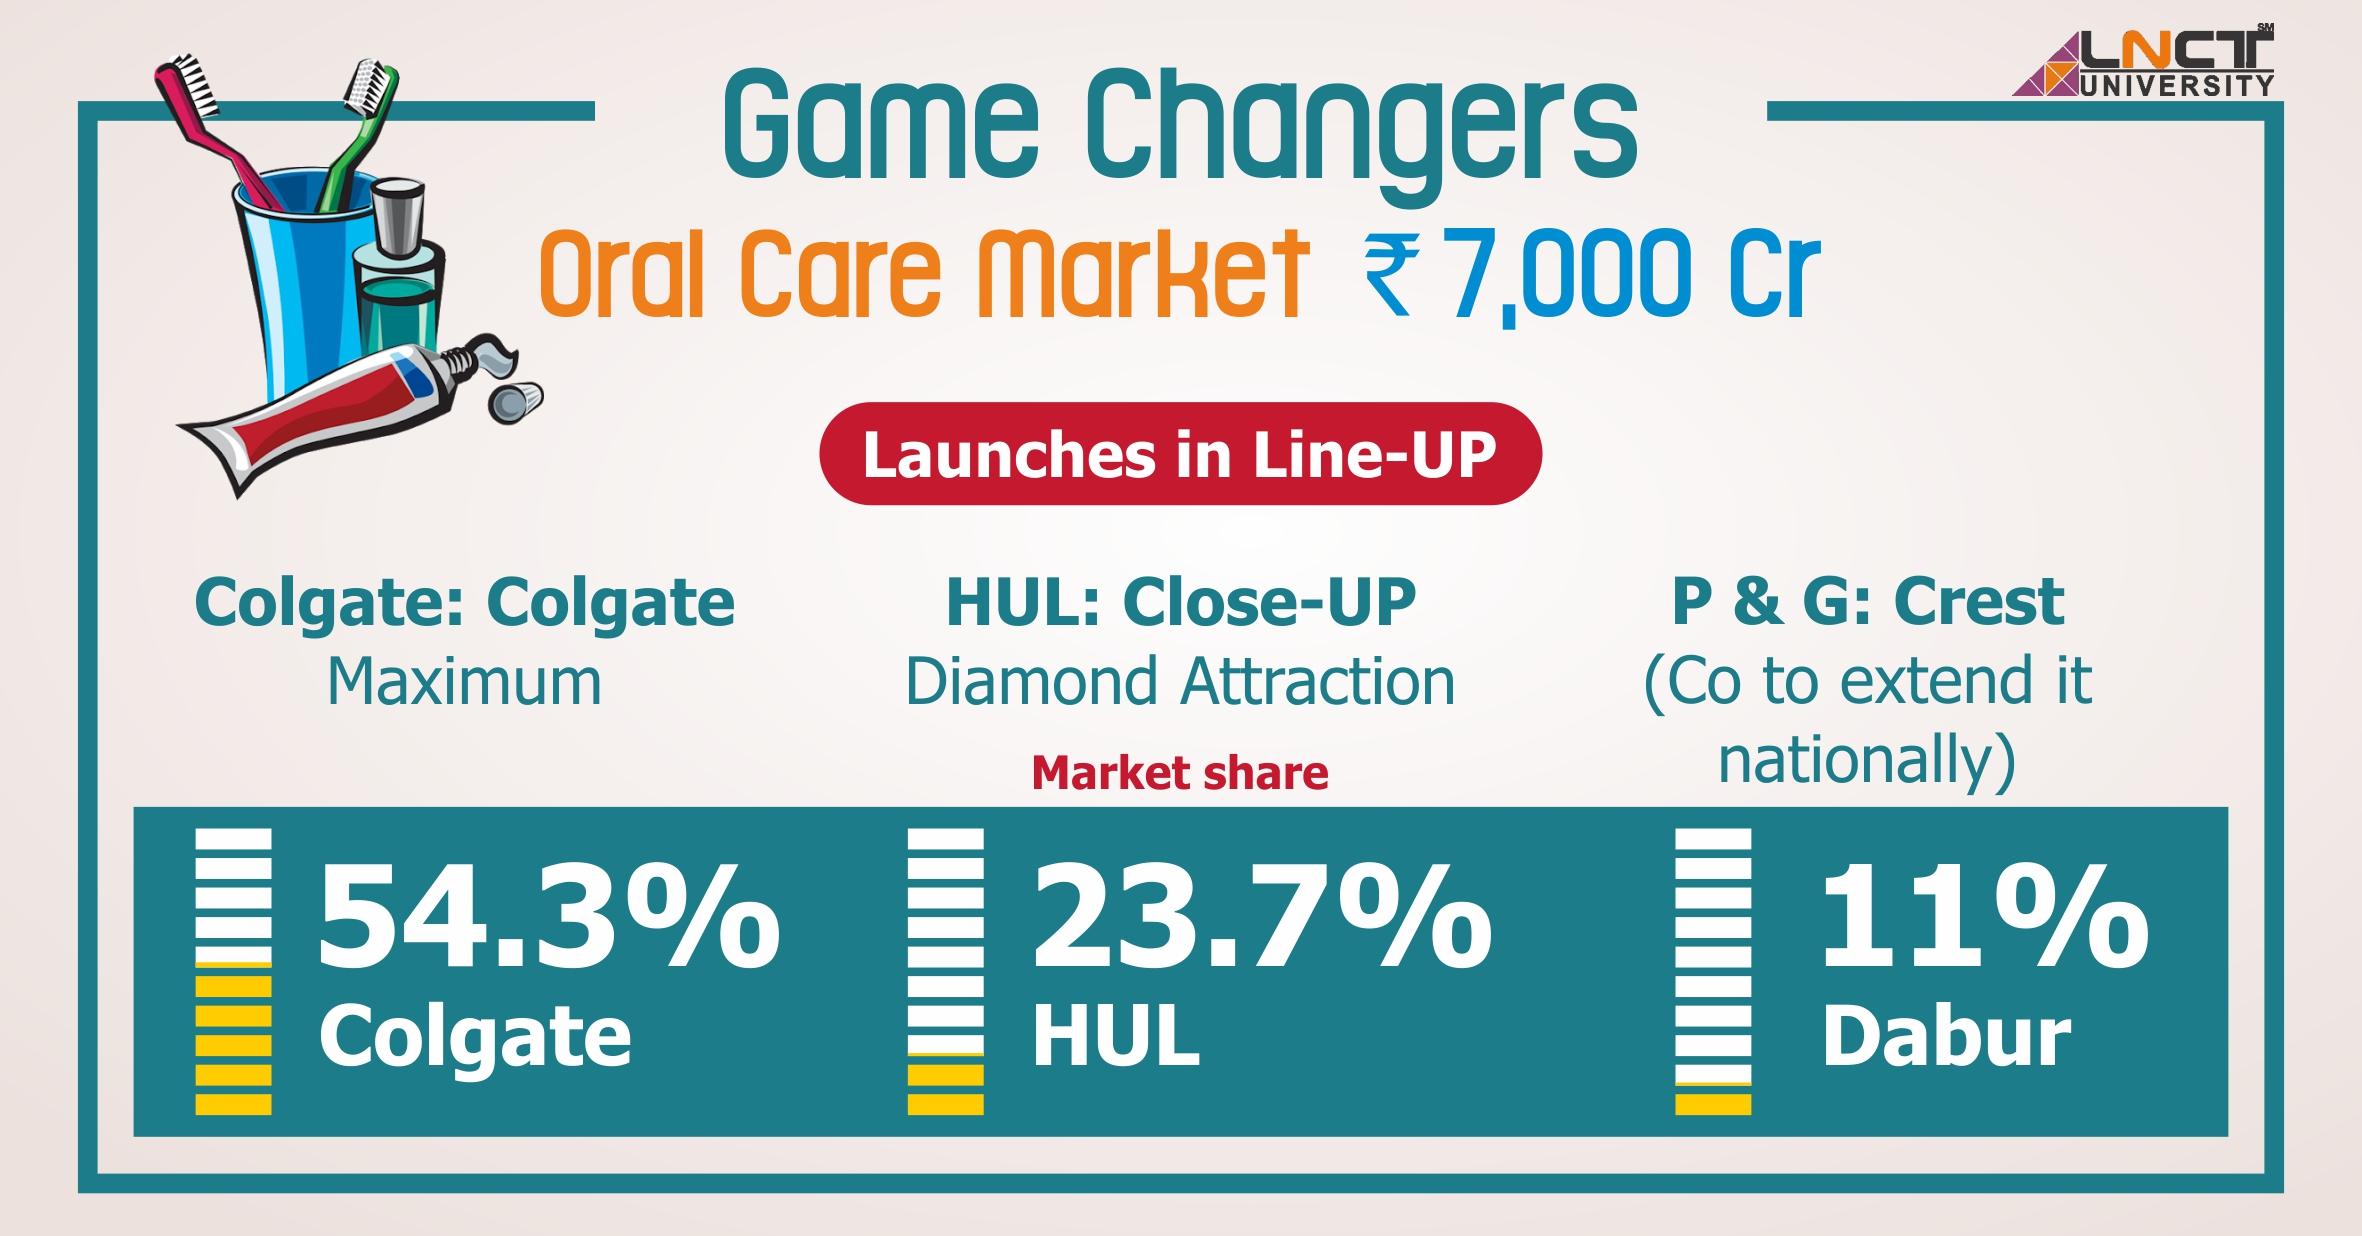 Oral Care Market Leaders